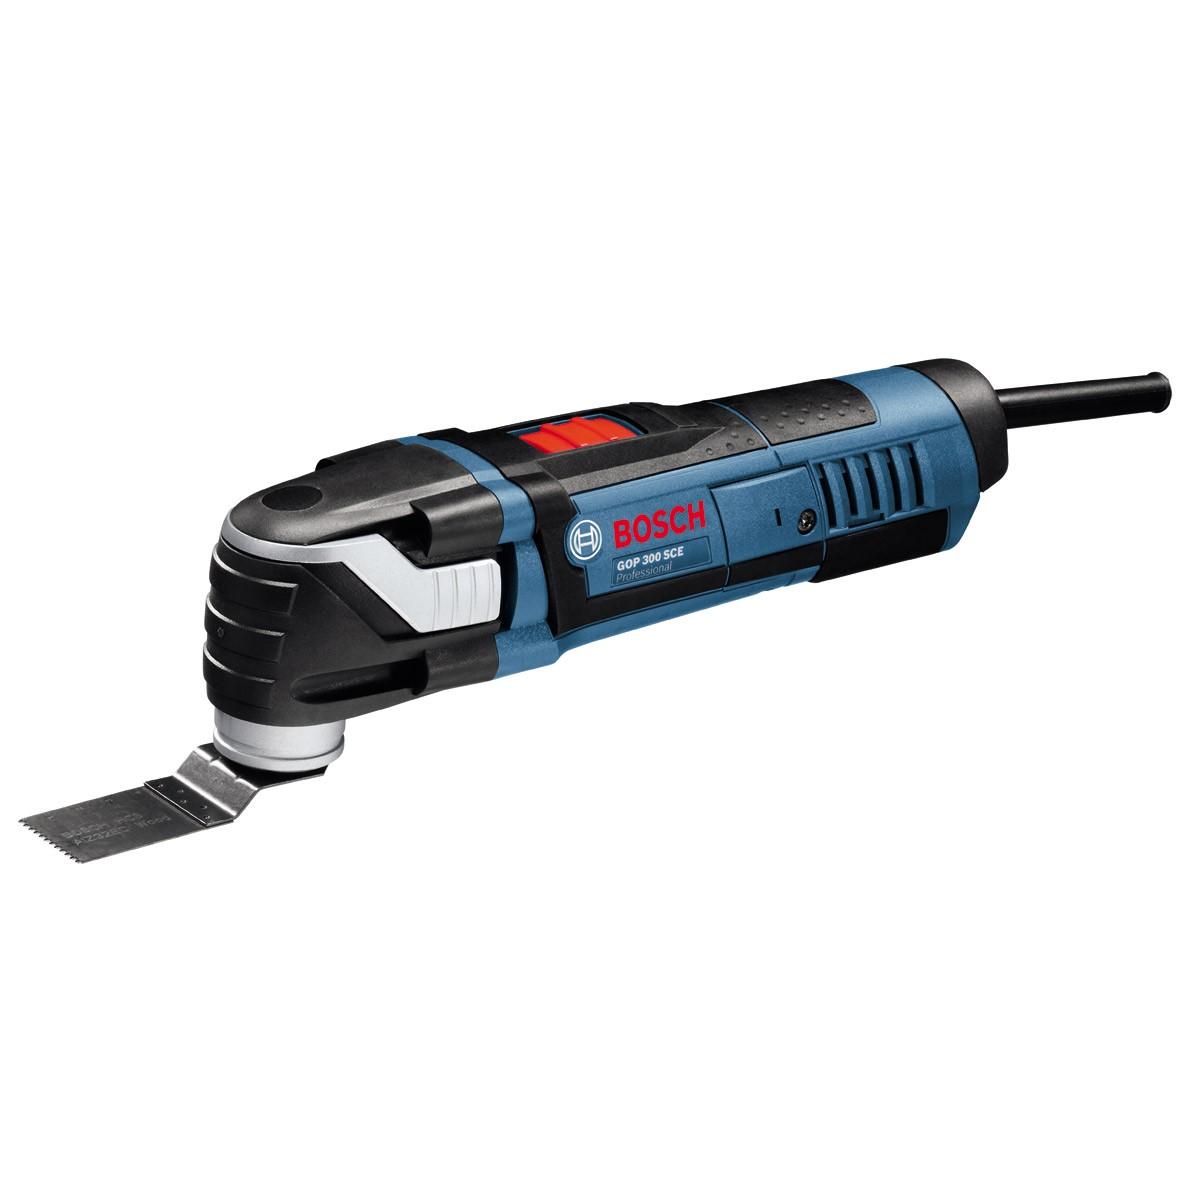 Bosch GOP 300 SCE